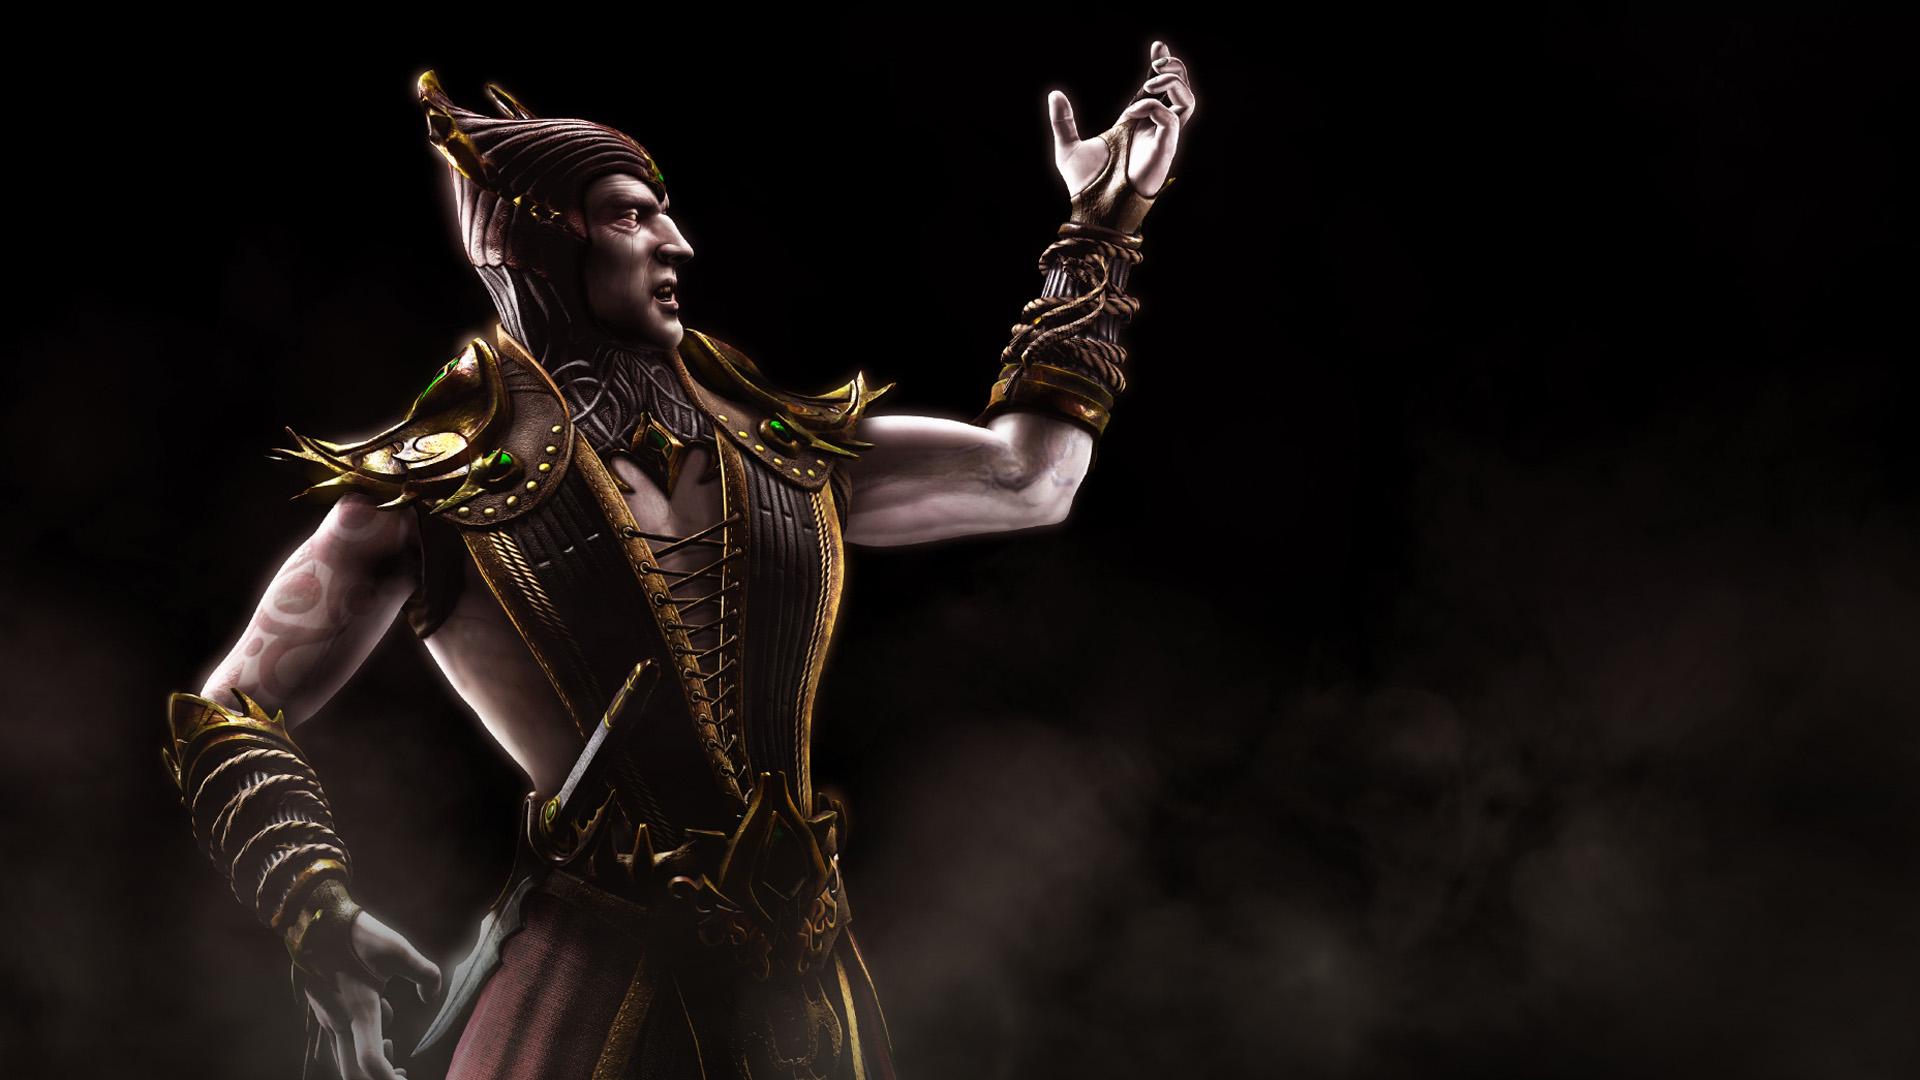 Dari Perubahan Status Hingga Nama yang Unik, Ini Beberapa Fakta Shinnok Mortal Kombat!